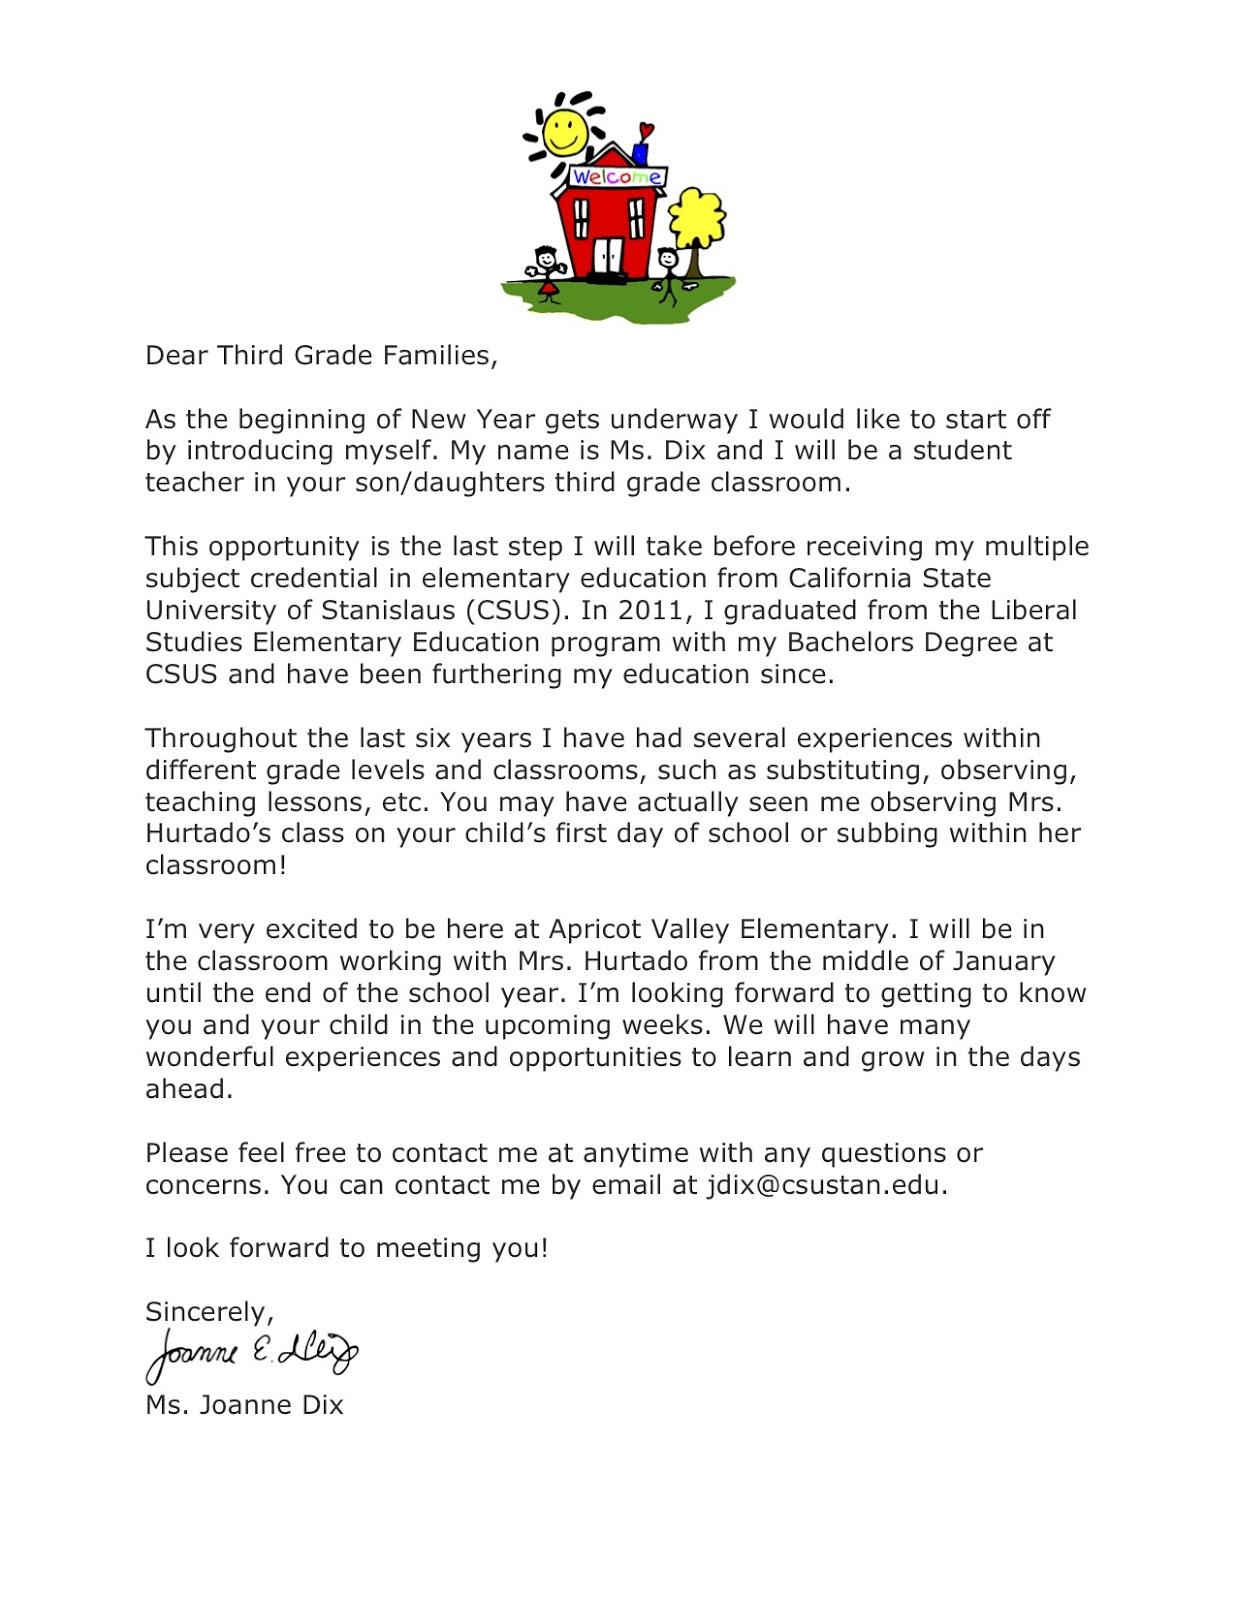 Introduction Letter Teacher Resume. resume cover letters letter of